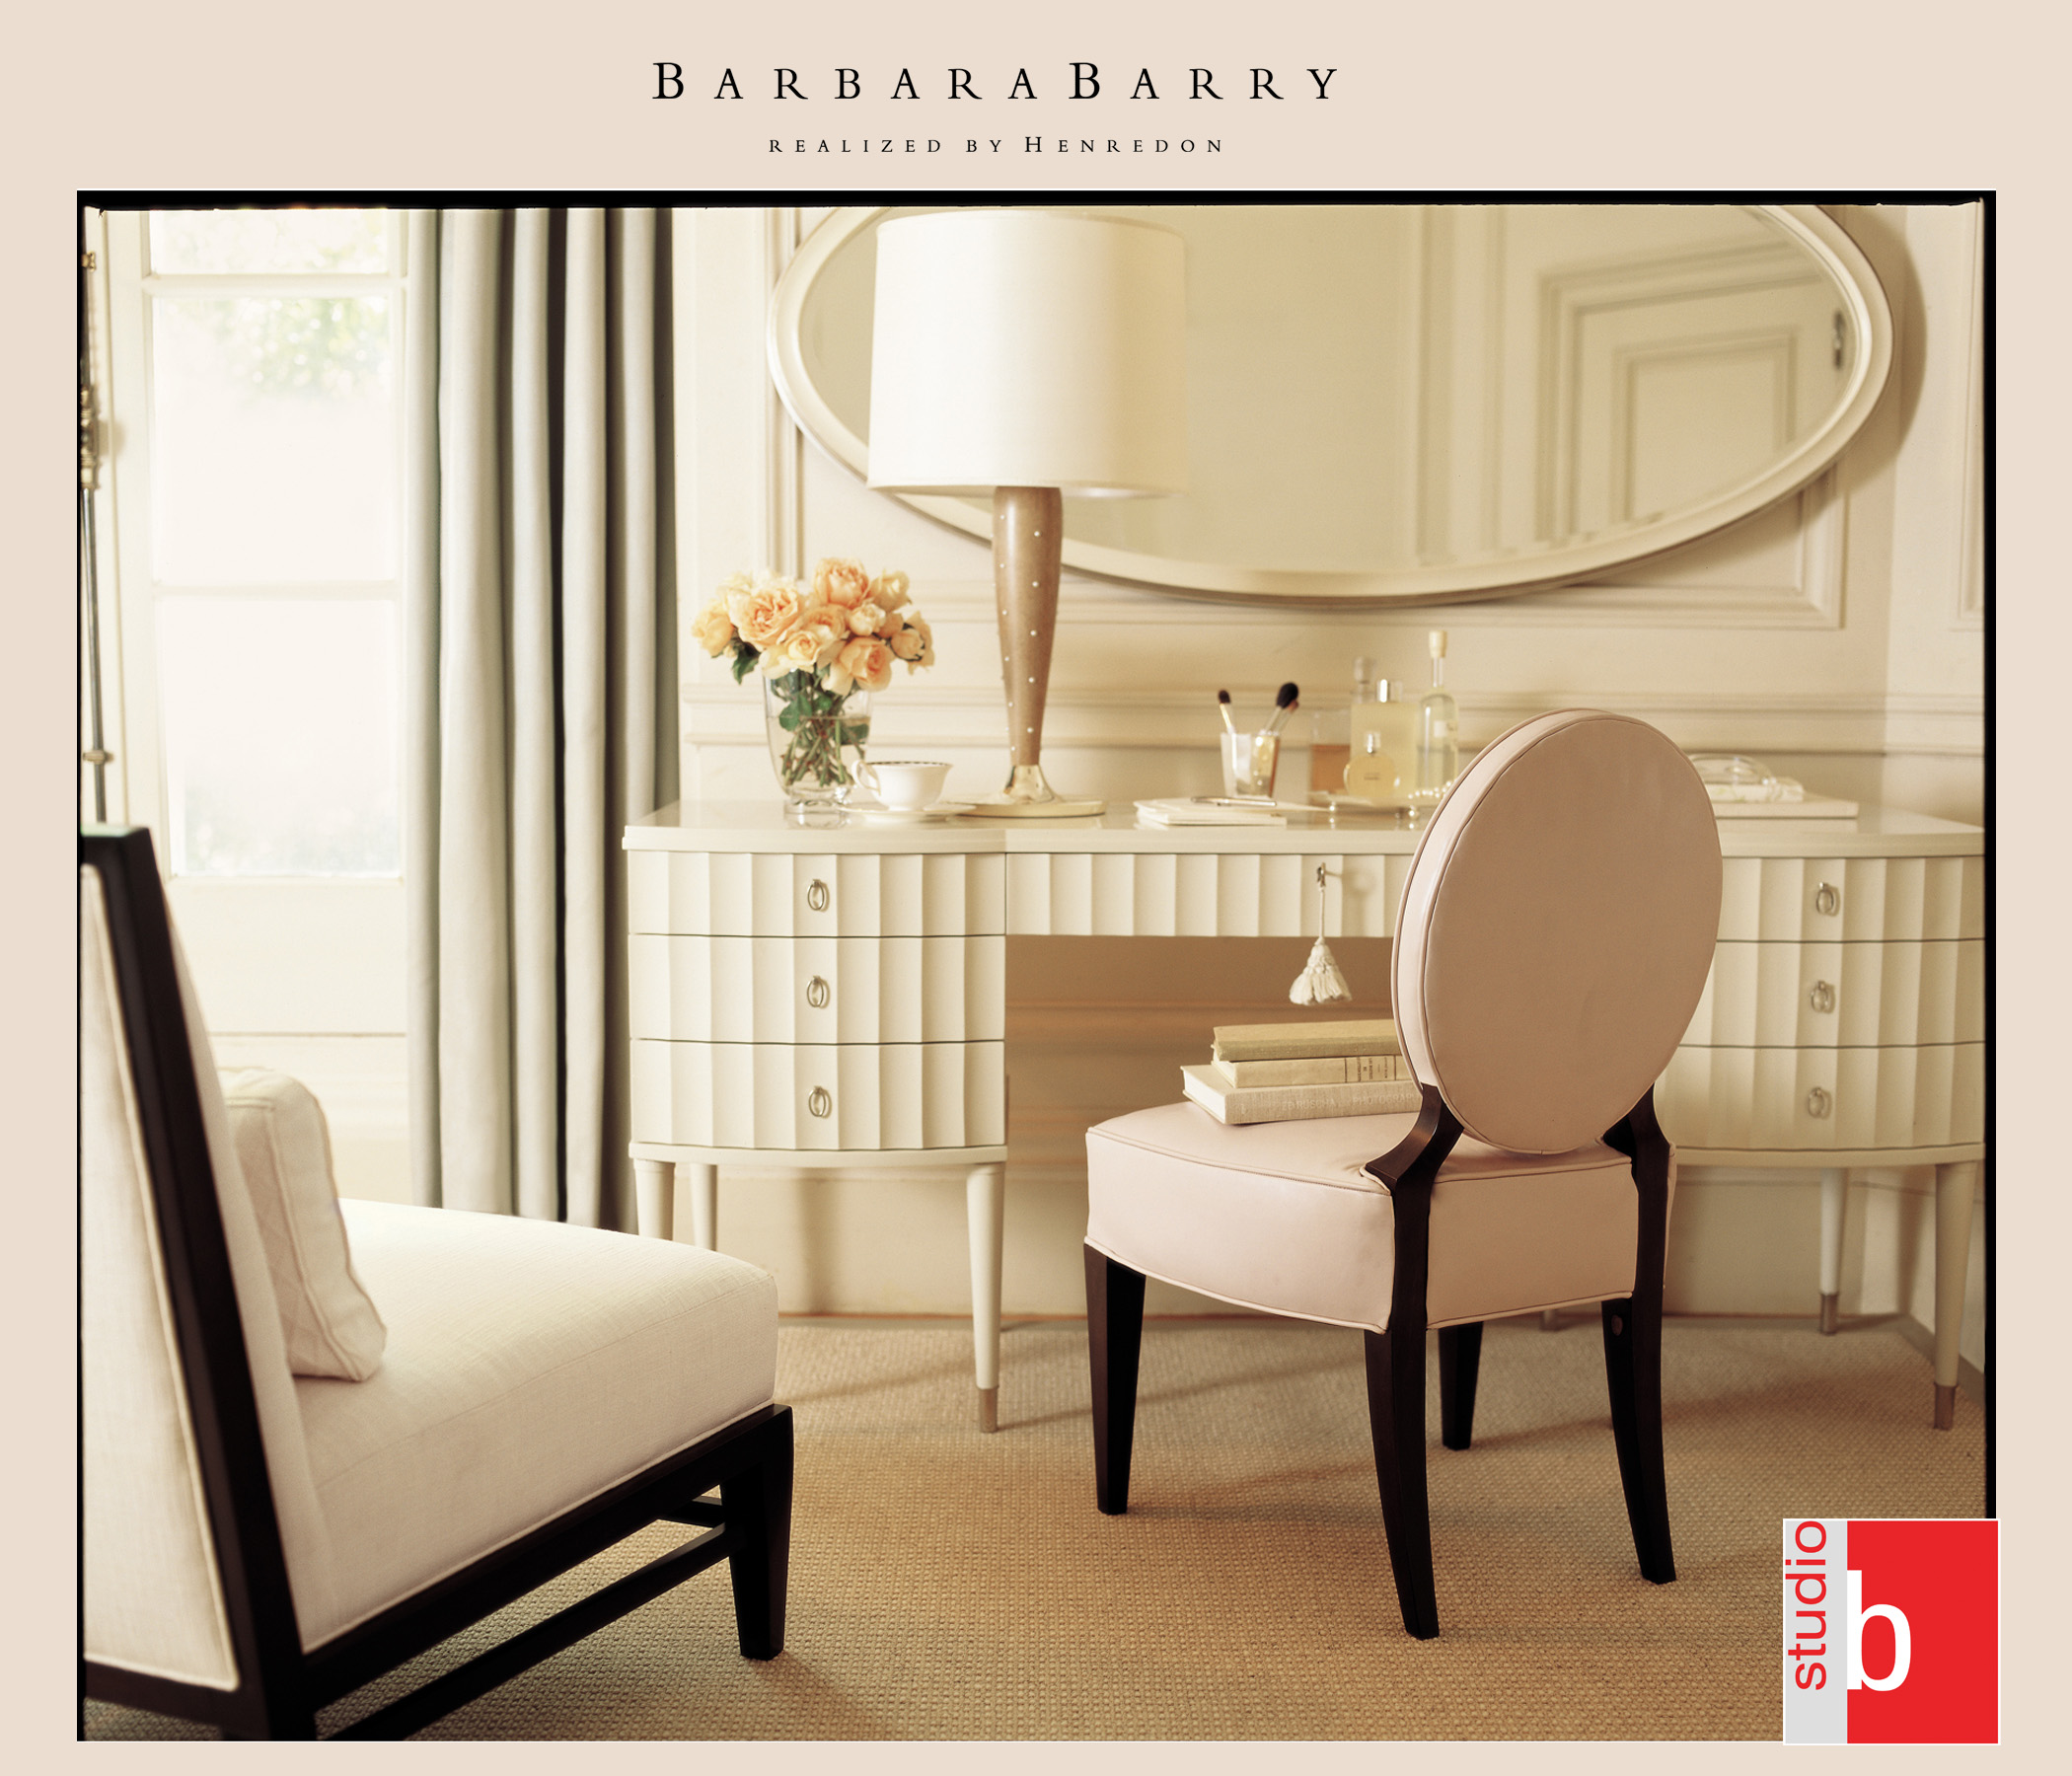 barbara barry on pinterest 27 pins. Black Bedroom Furniture Sets. Home Design Ideas